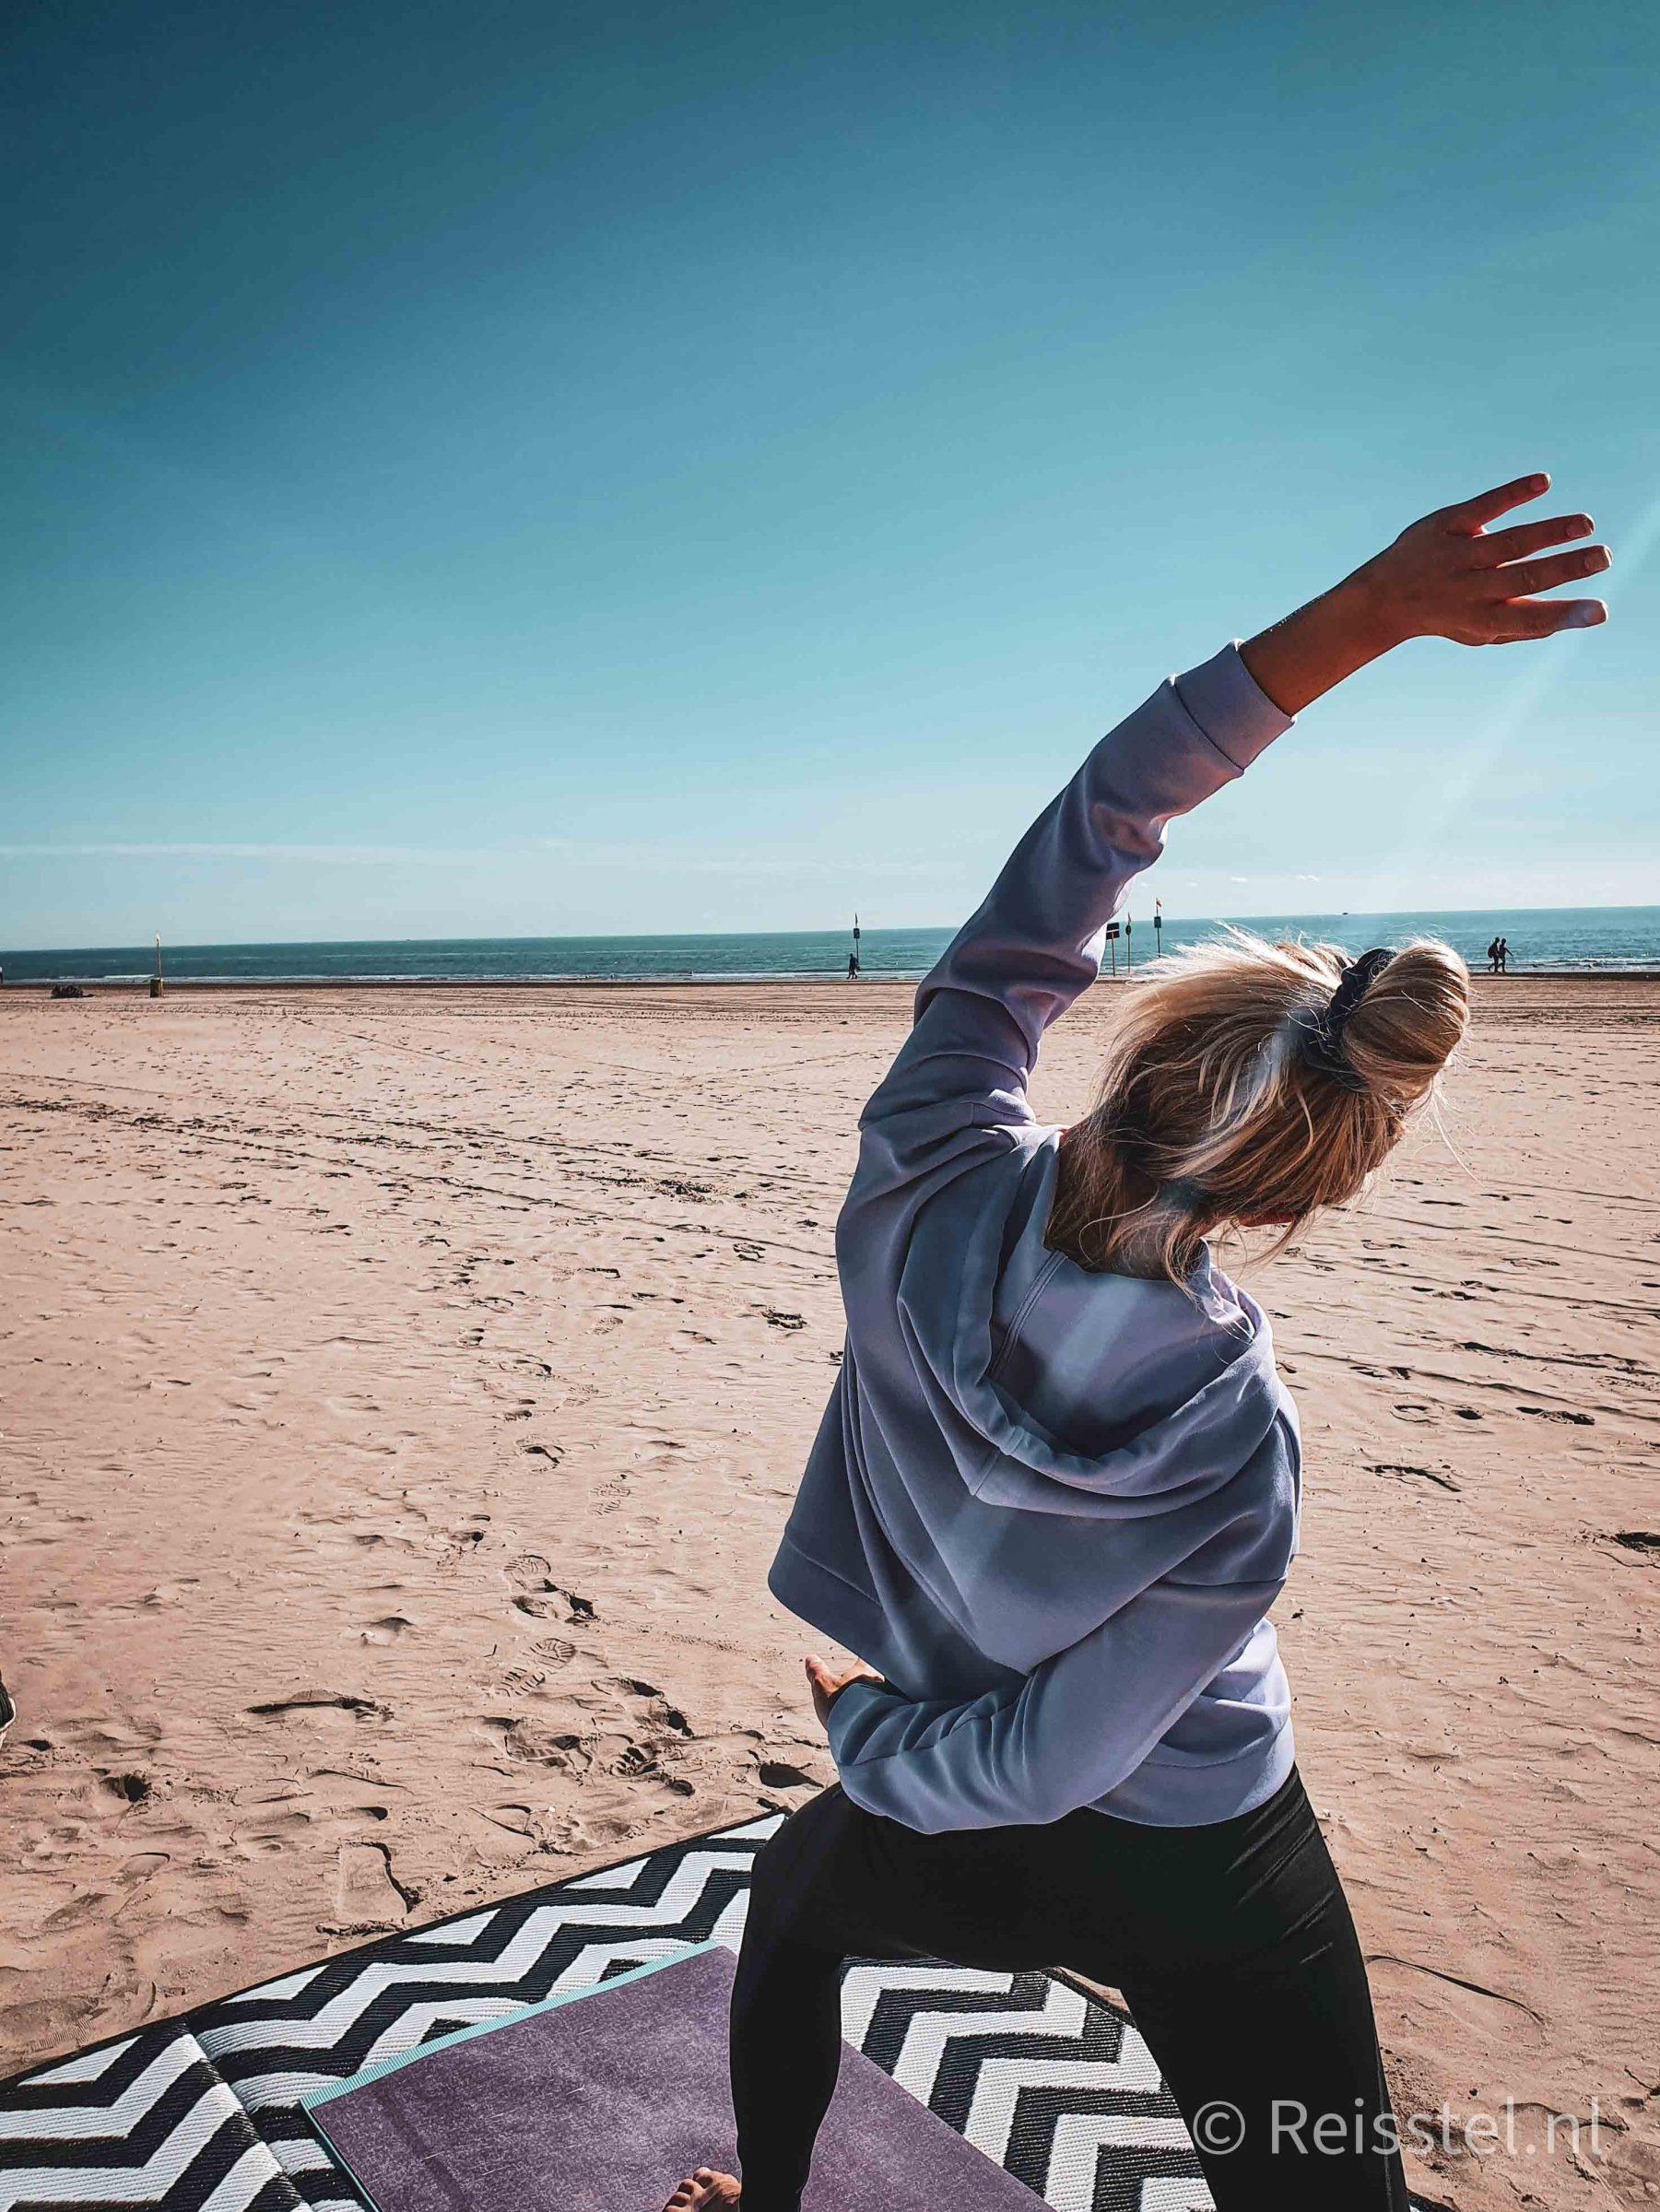 Reisstel.nl | 2 maanden in Italië | yoga op leeg strand